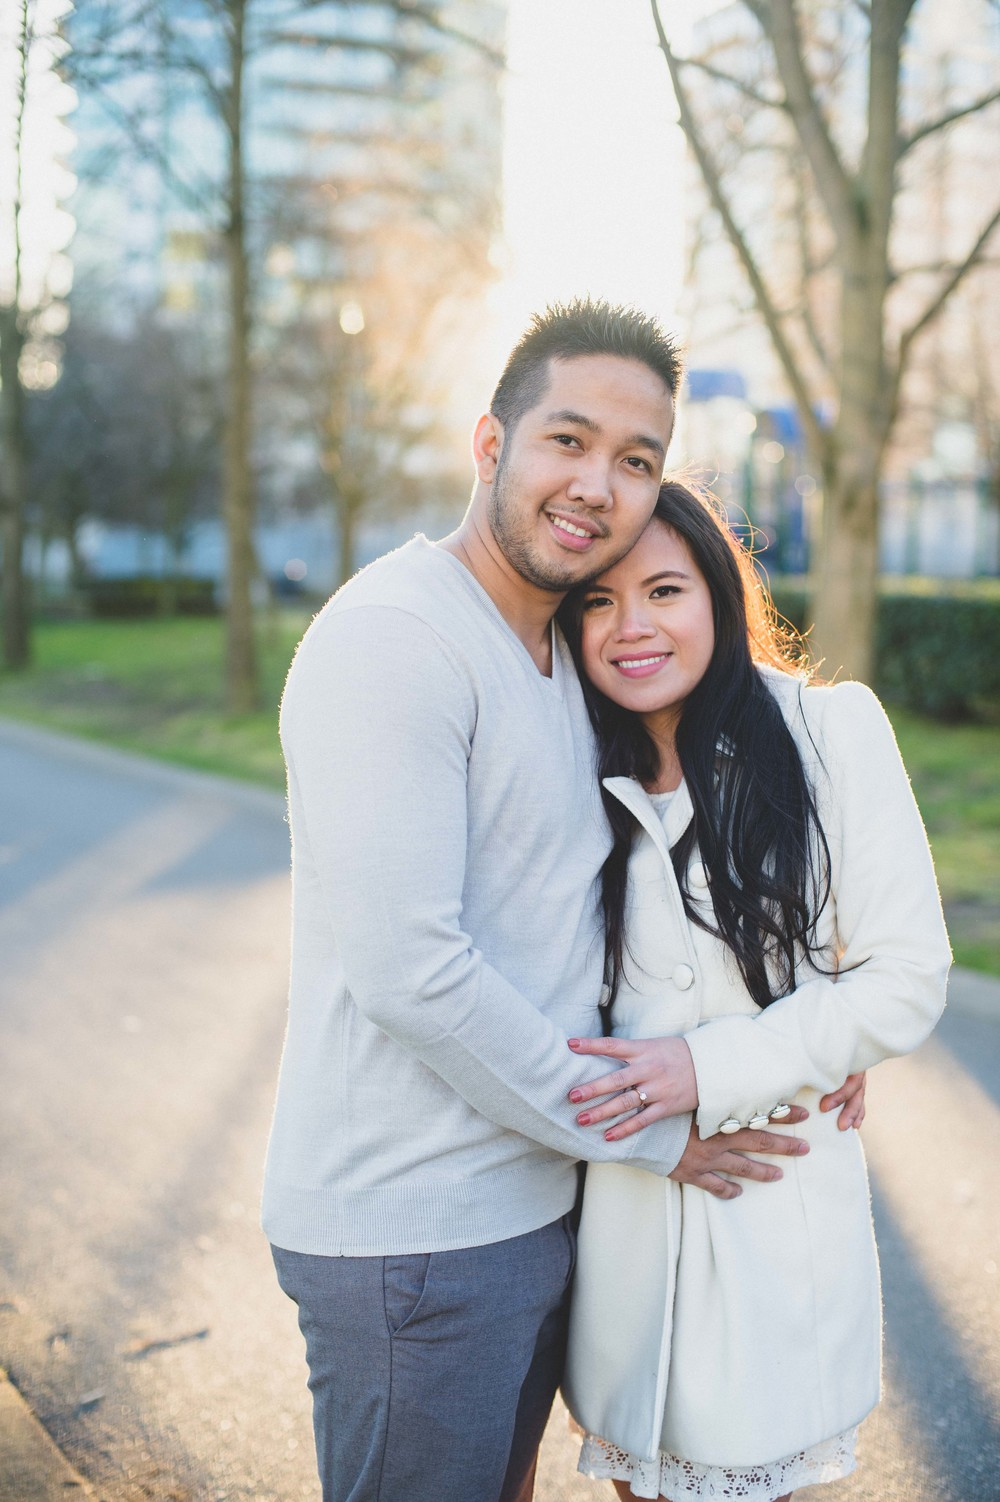 Vancouver David Lam Park Wedding Photographer Edward Lai Photography-9.jpg